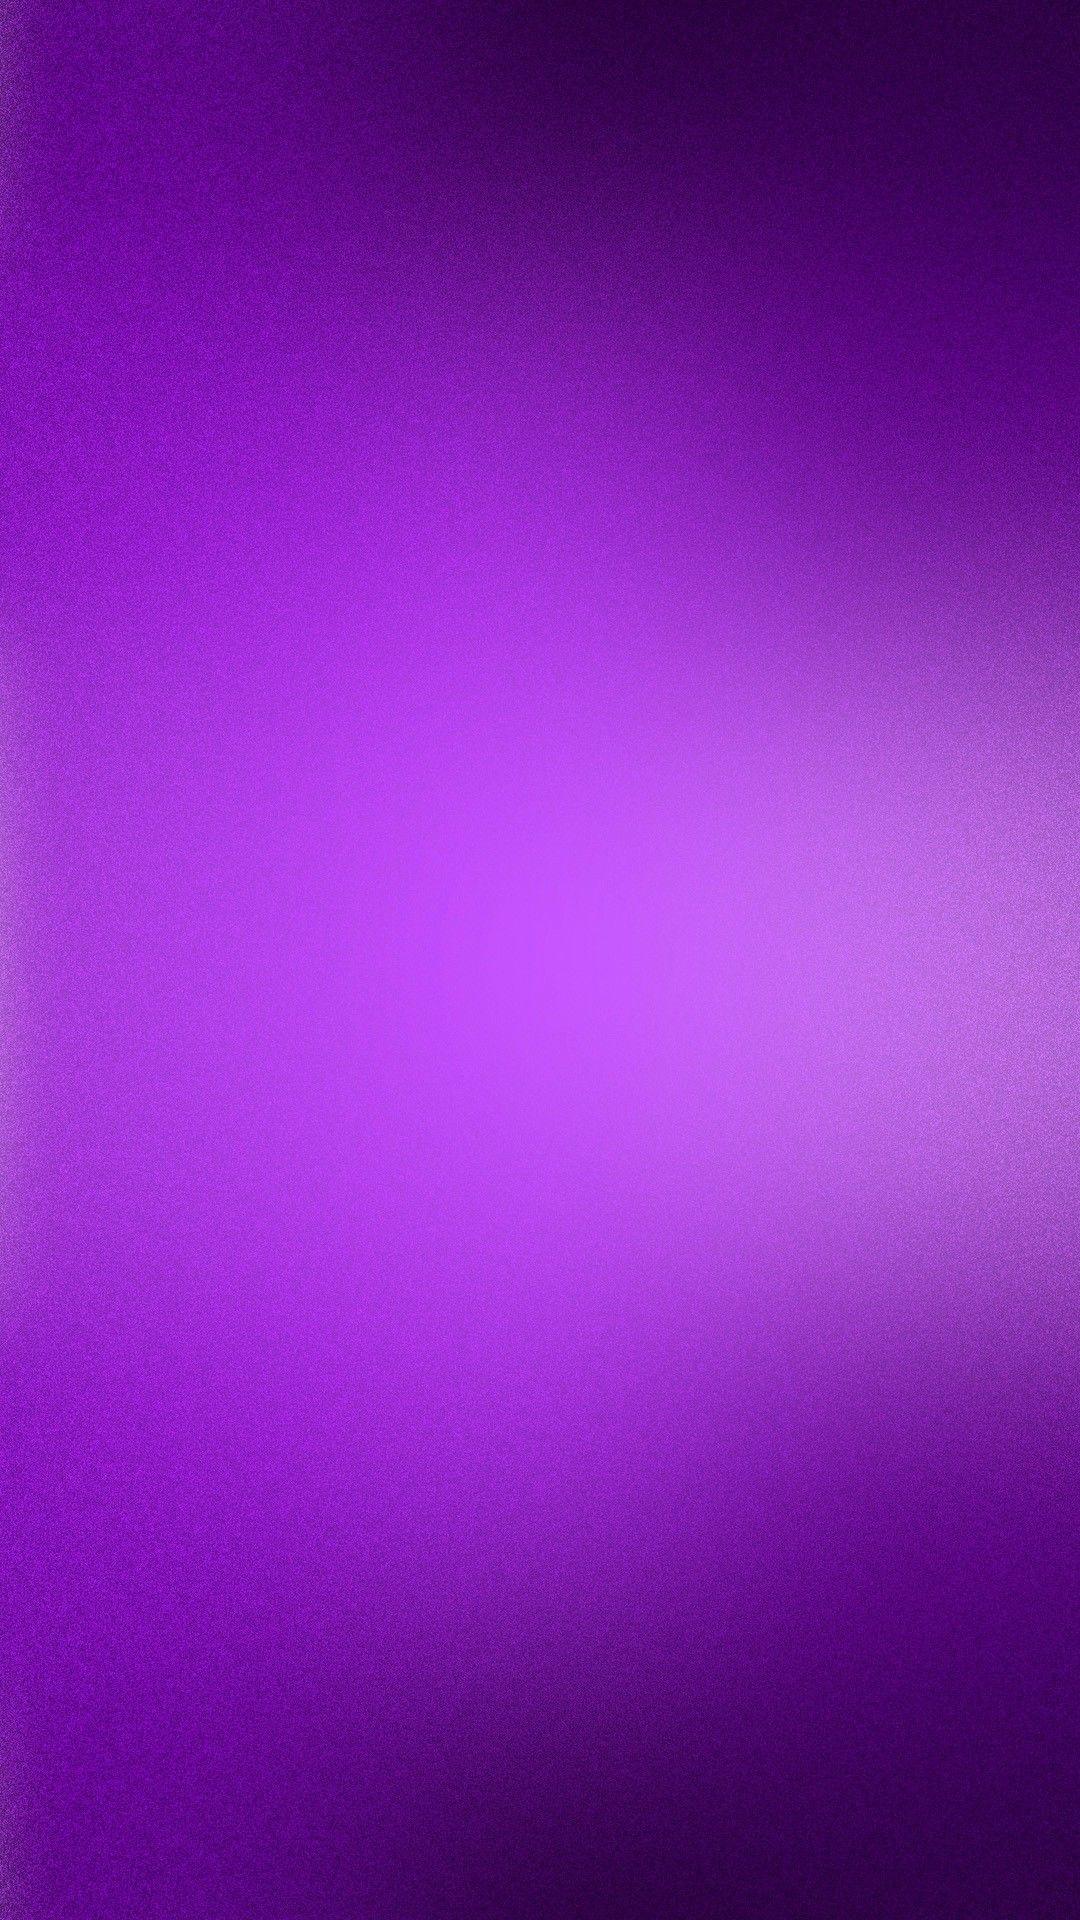 Aesthetic Dark Purple Wallpapers - Wallpaper Cave